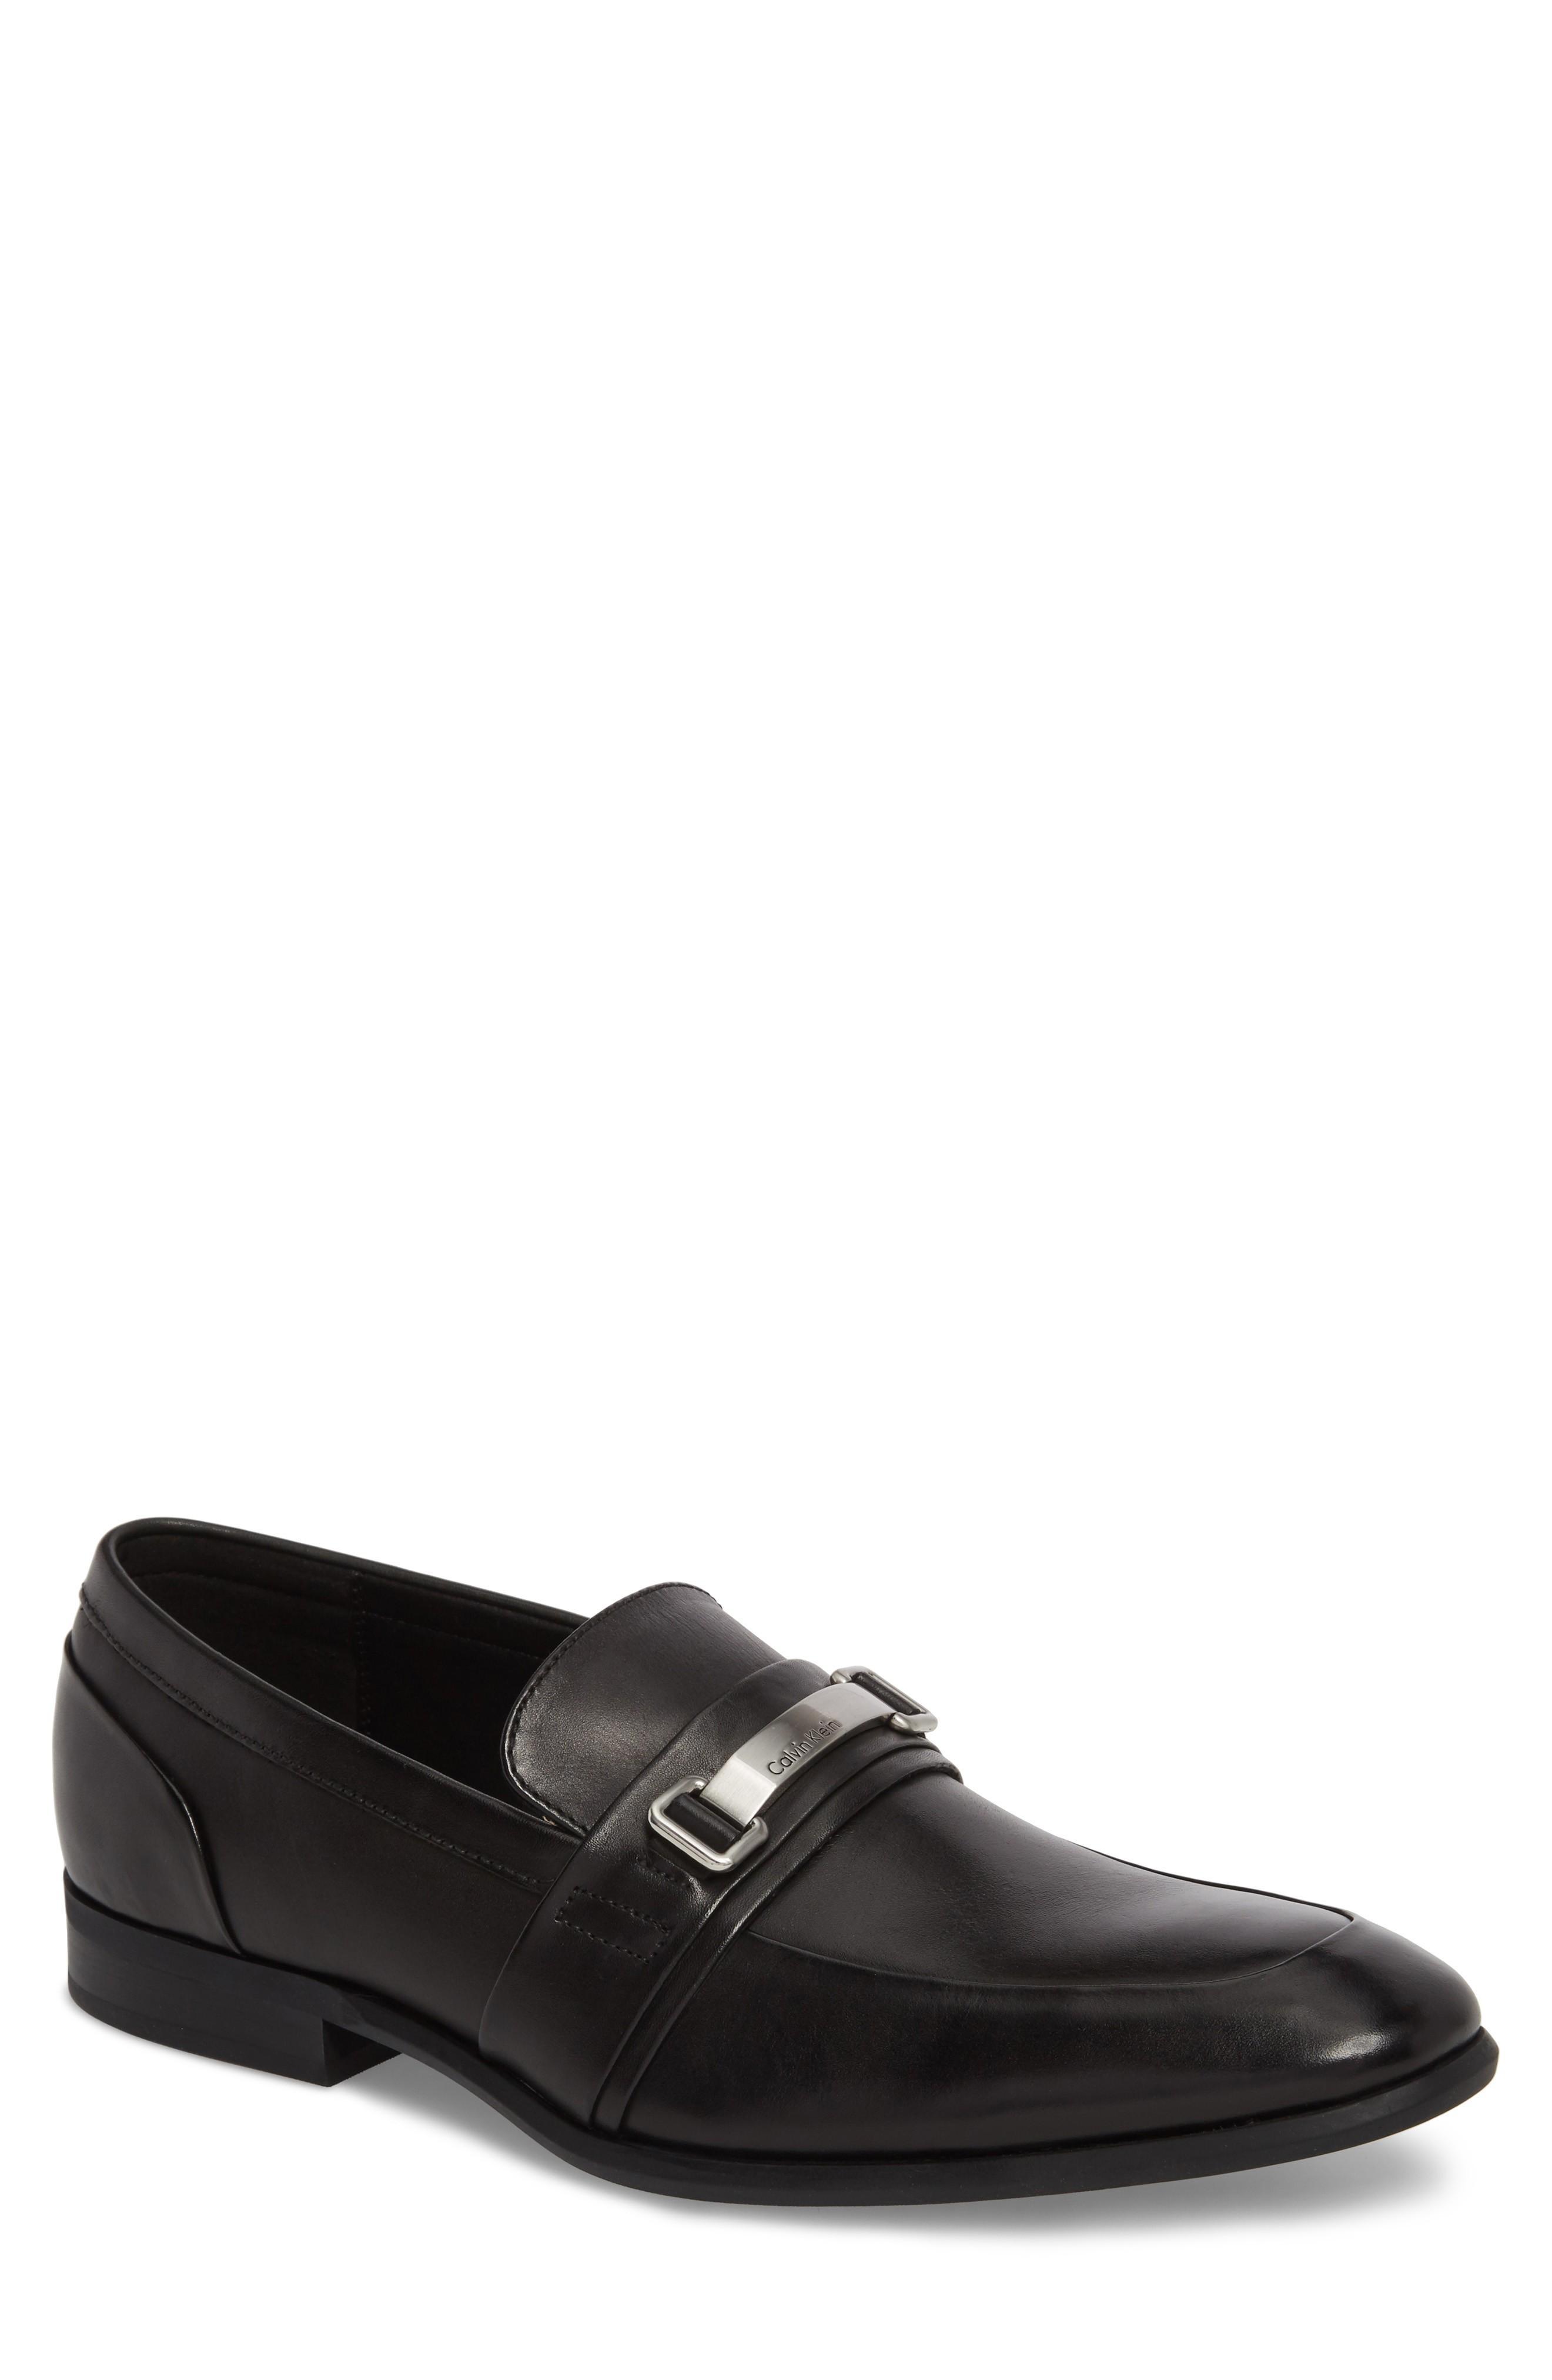 Calvin Klein Lawdon Venetian Loafer In Black Leather